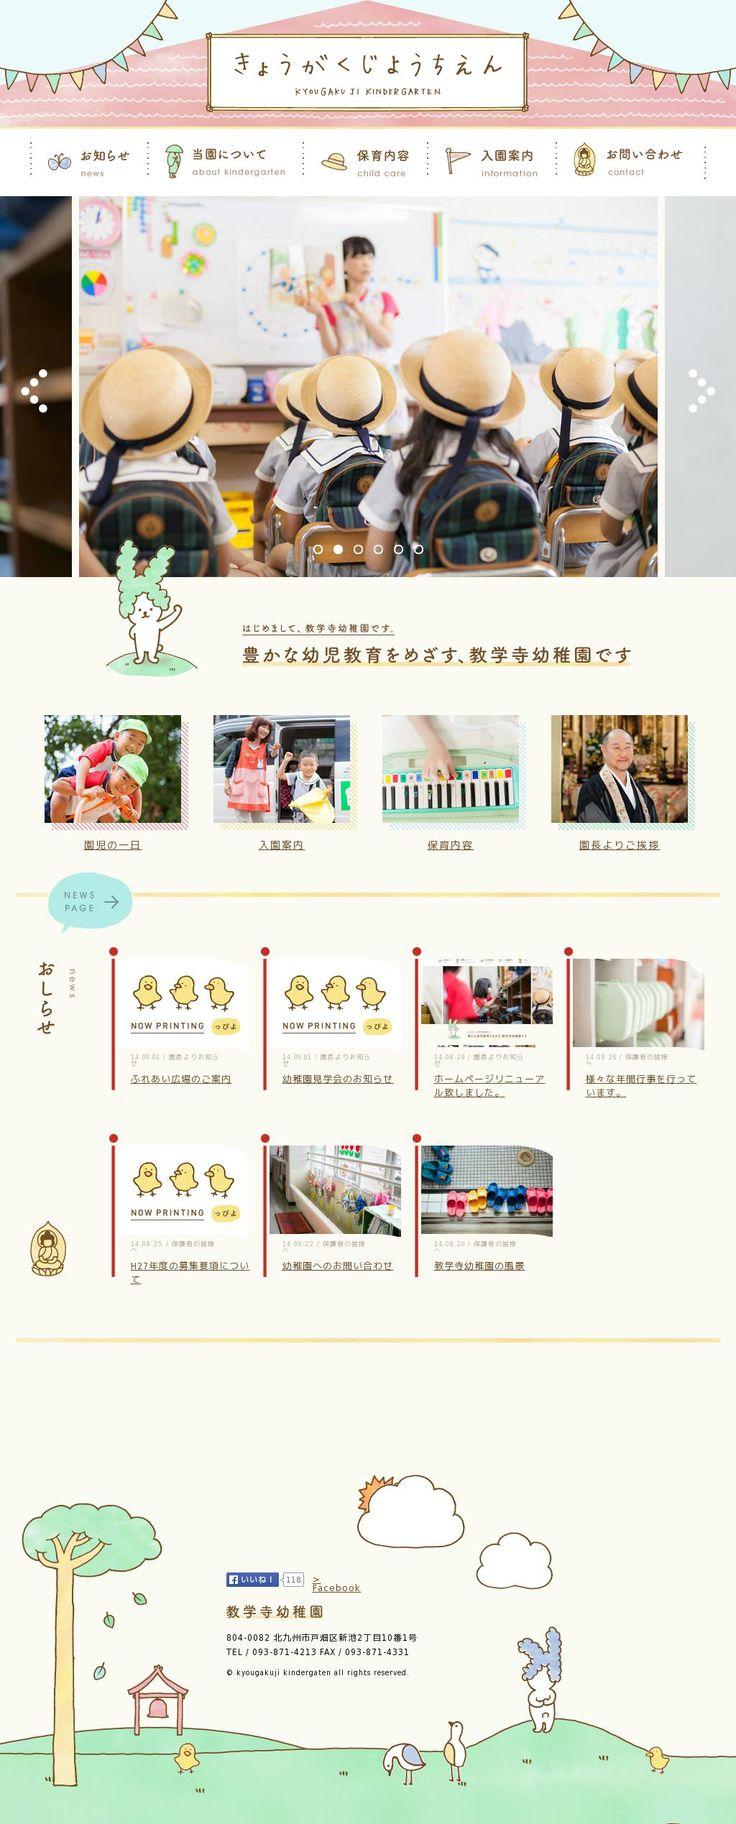 The website 'http://kyougakuji-kids.com/' courtesy of @Pinstamatic (http://pinstamatic.com)